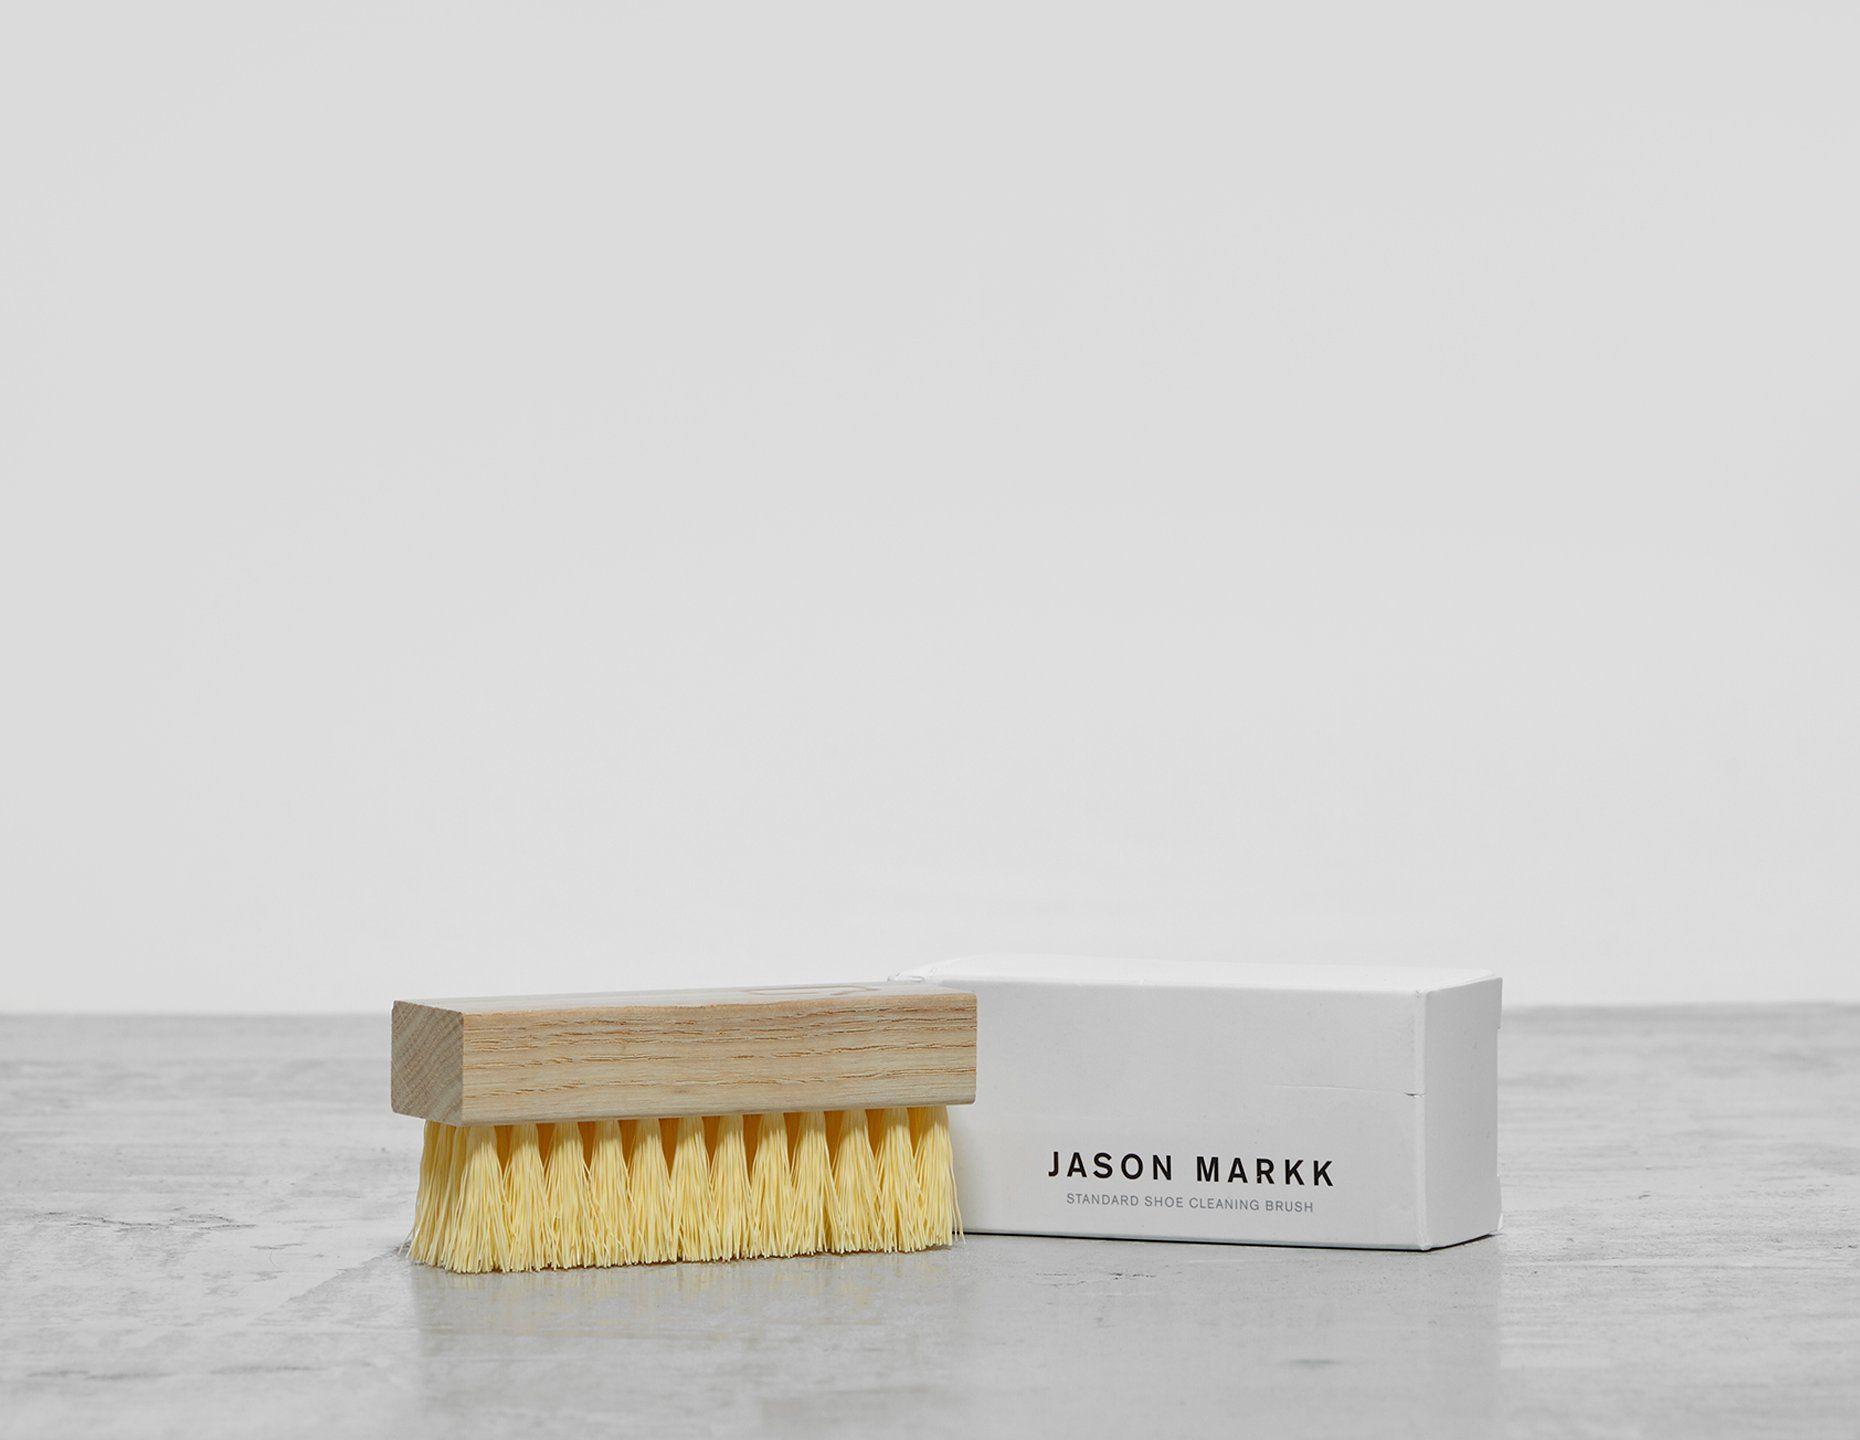 Jason Markk Standard Shoe Cleaning Brush